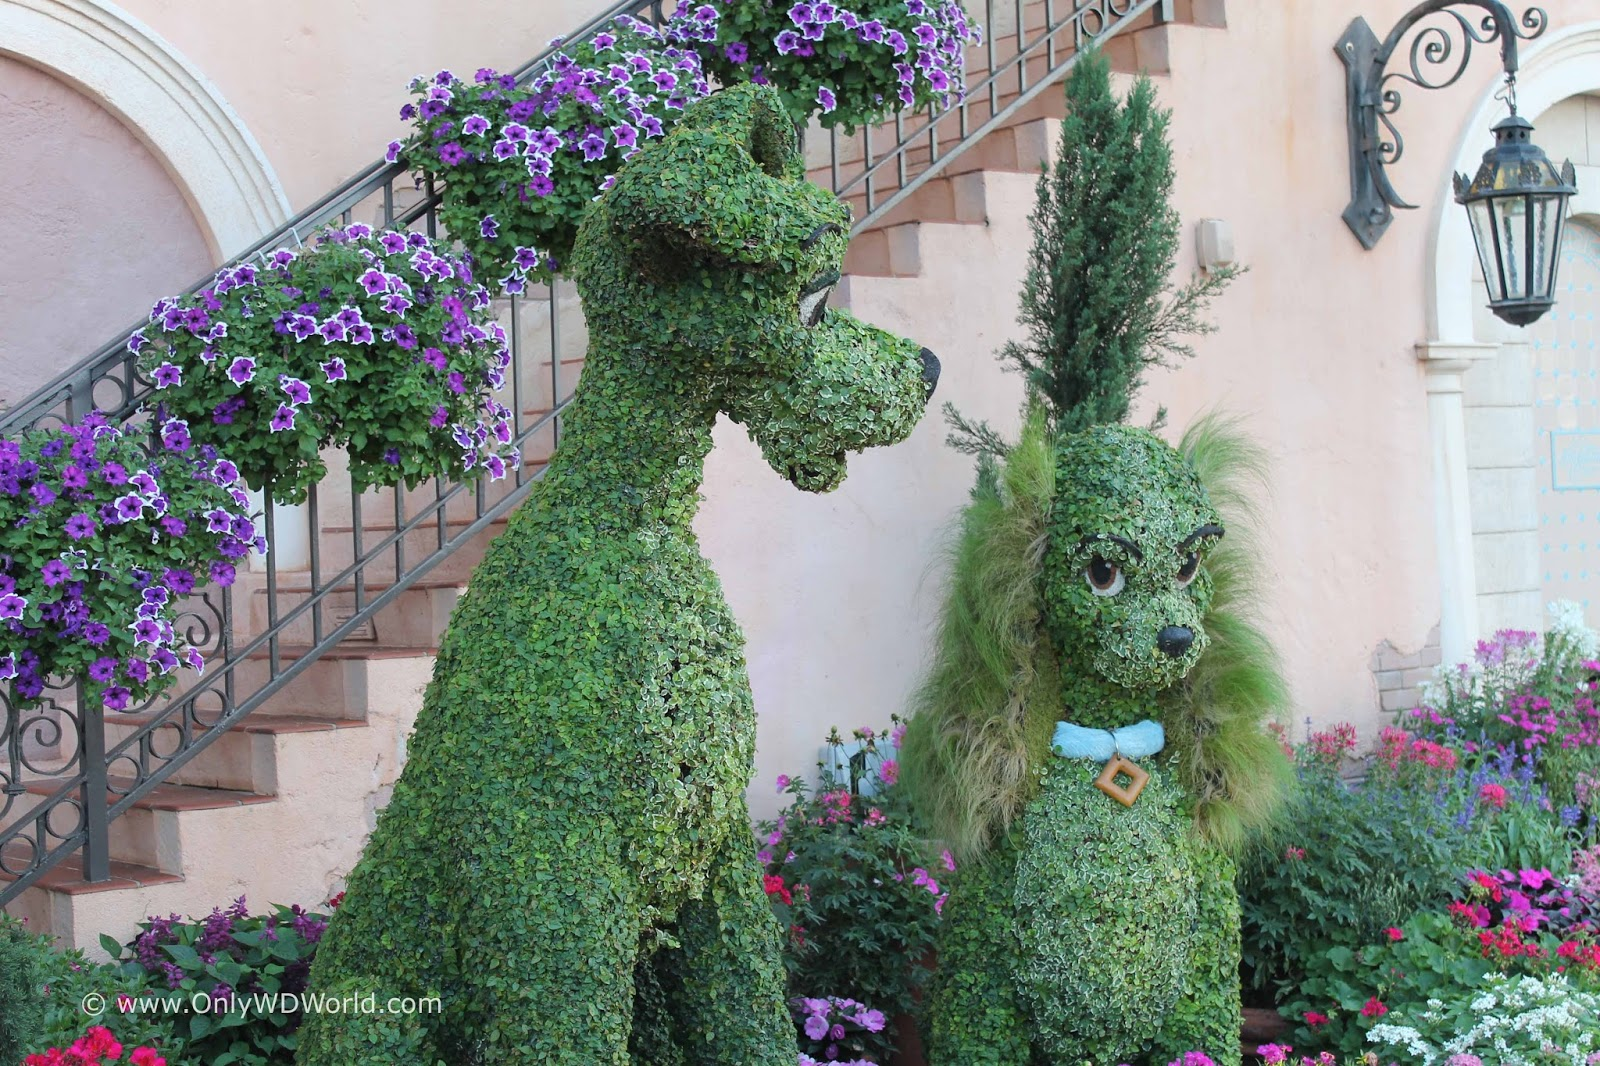 Epcot International Flower Garden Festival Dates For 2016 Disney World Blog Discussing Parks